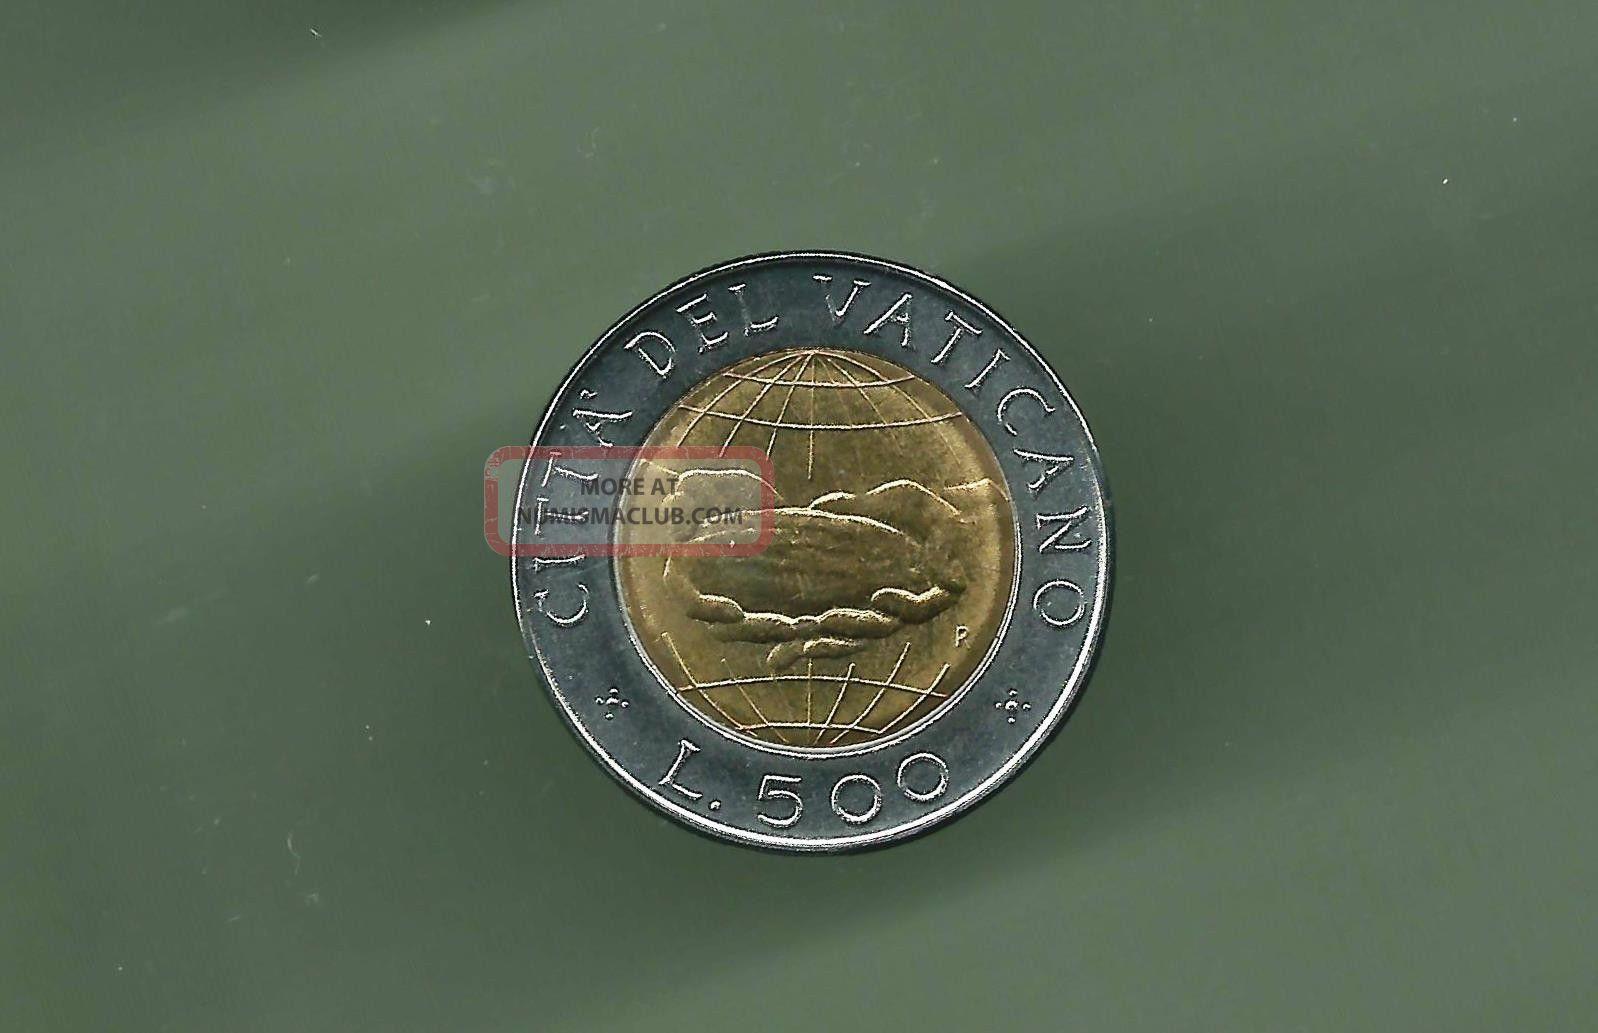 Vatican 1992 500 Lire Bi - Metallic Unc Coin Italy, San Marino, Vatican photo